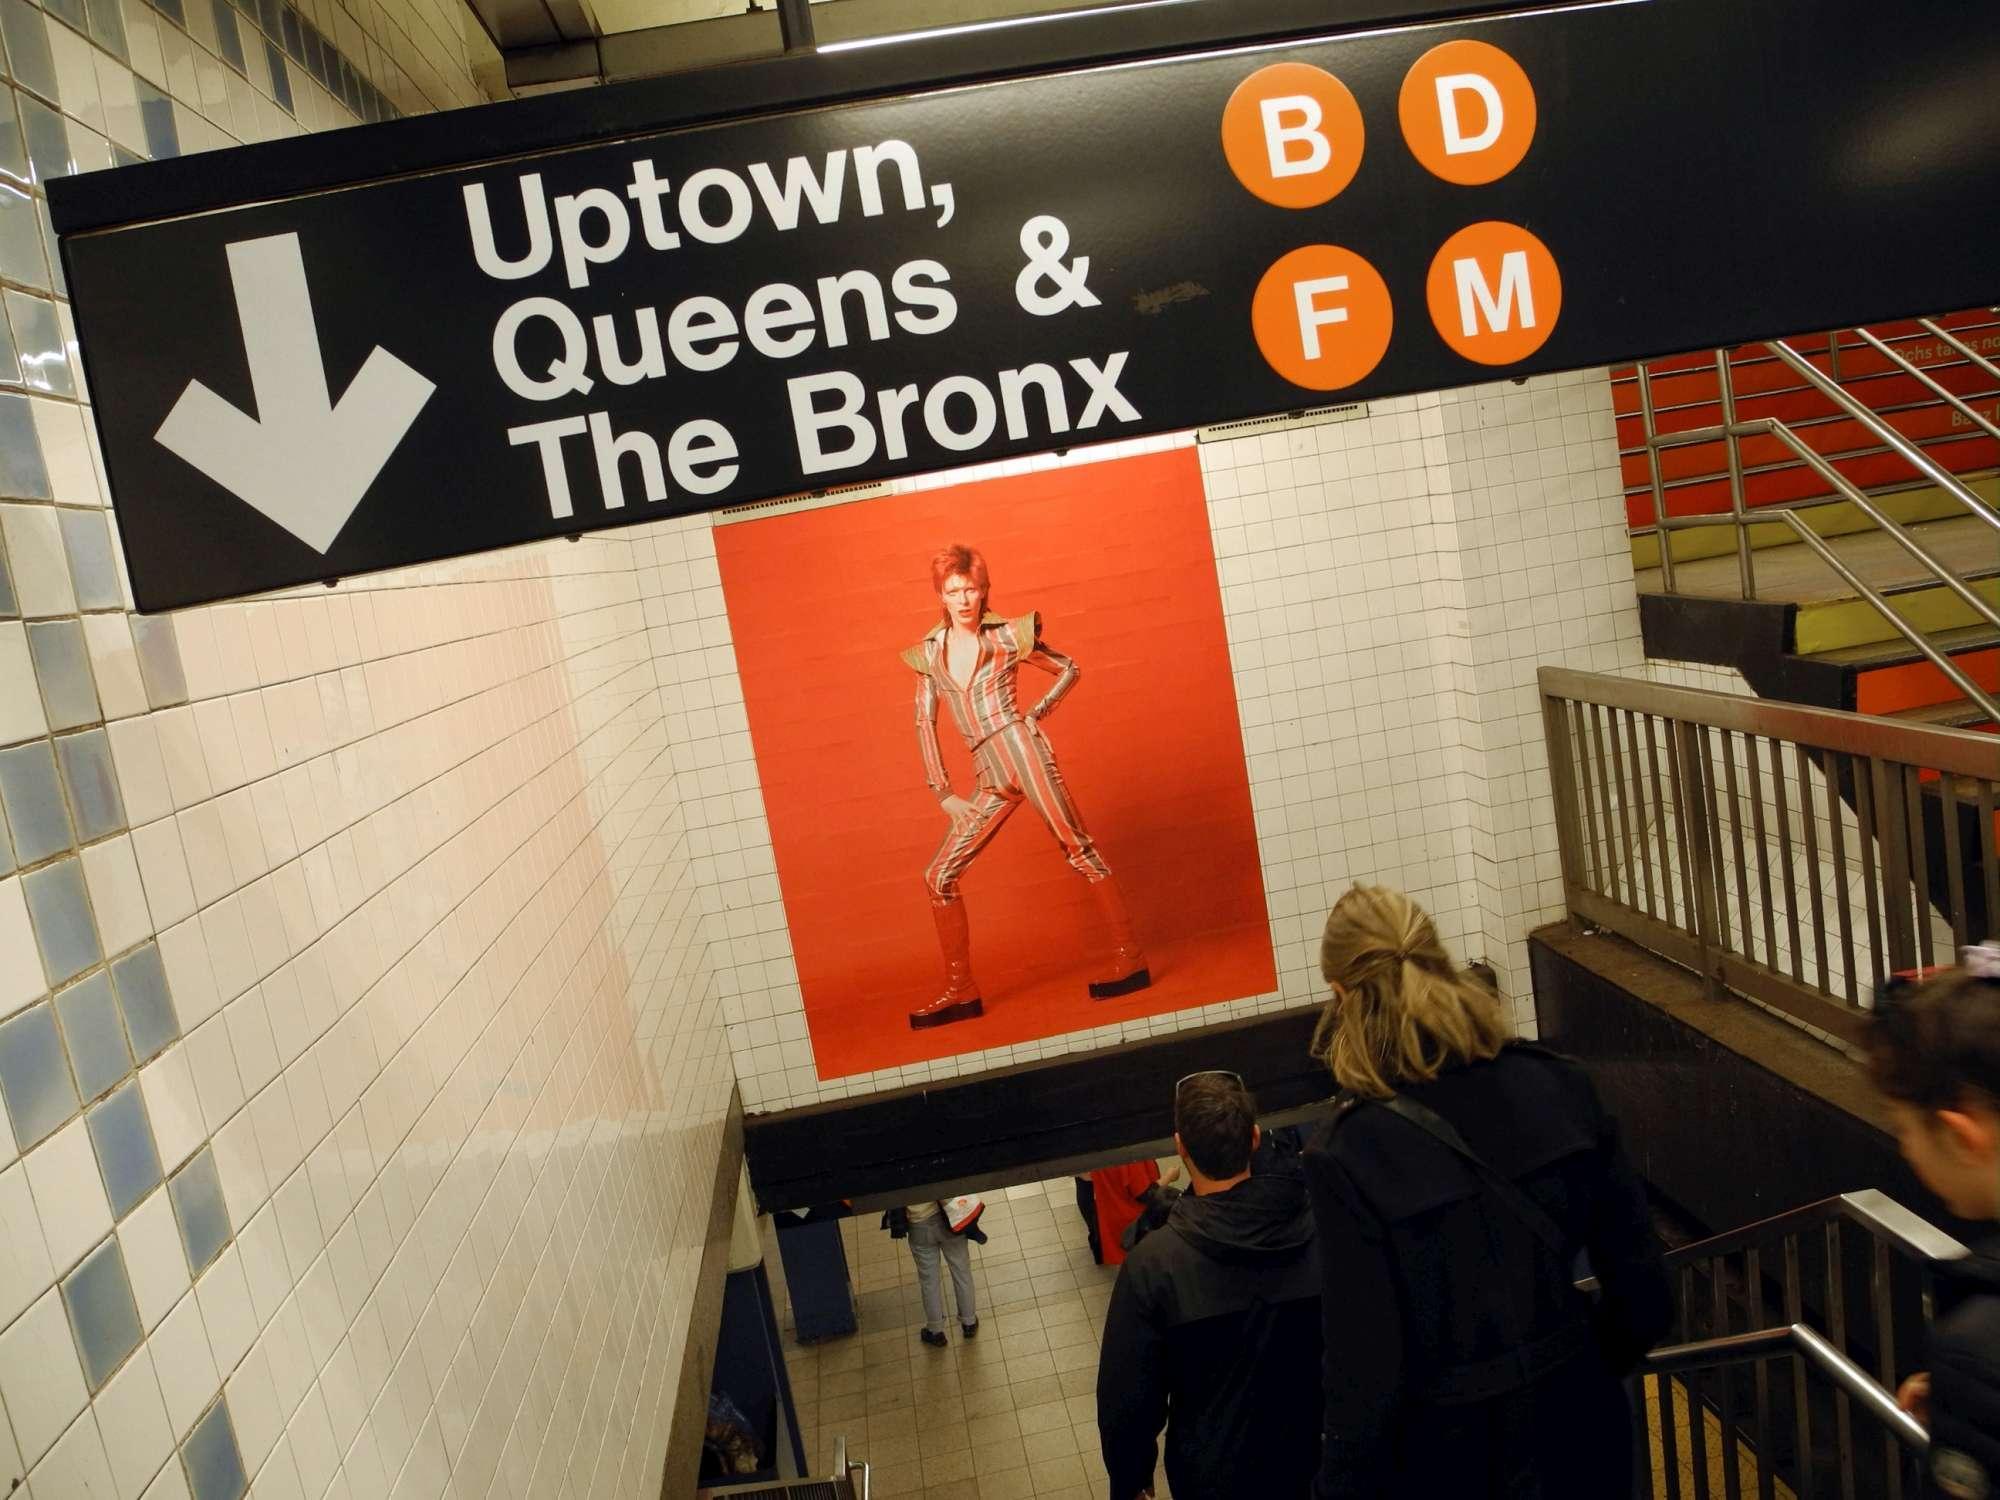 New York celebra David Bowie nella metropolitana di Broadway-Lafayette